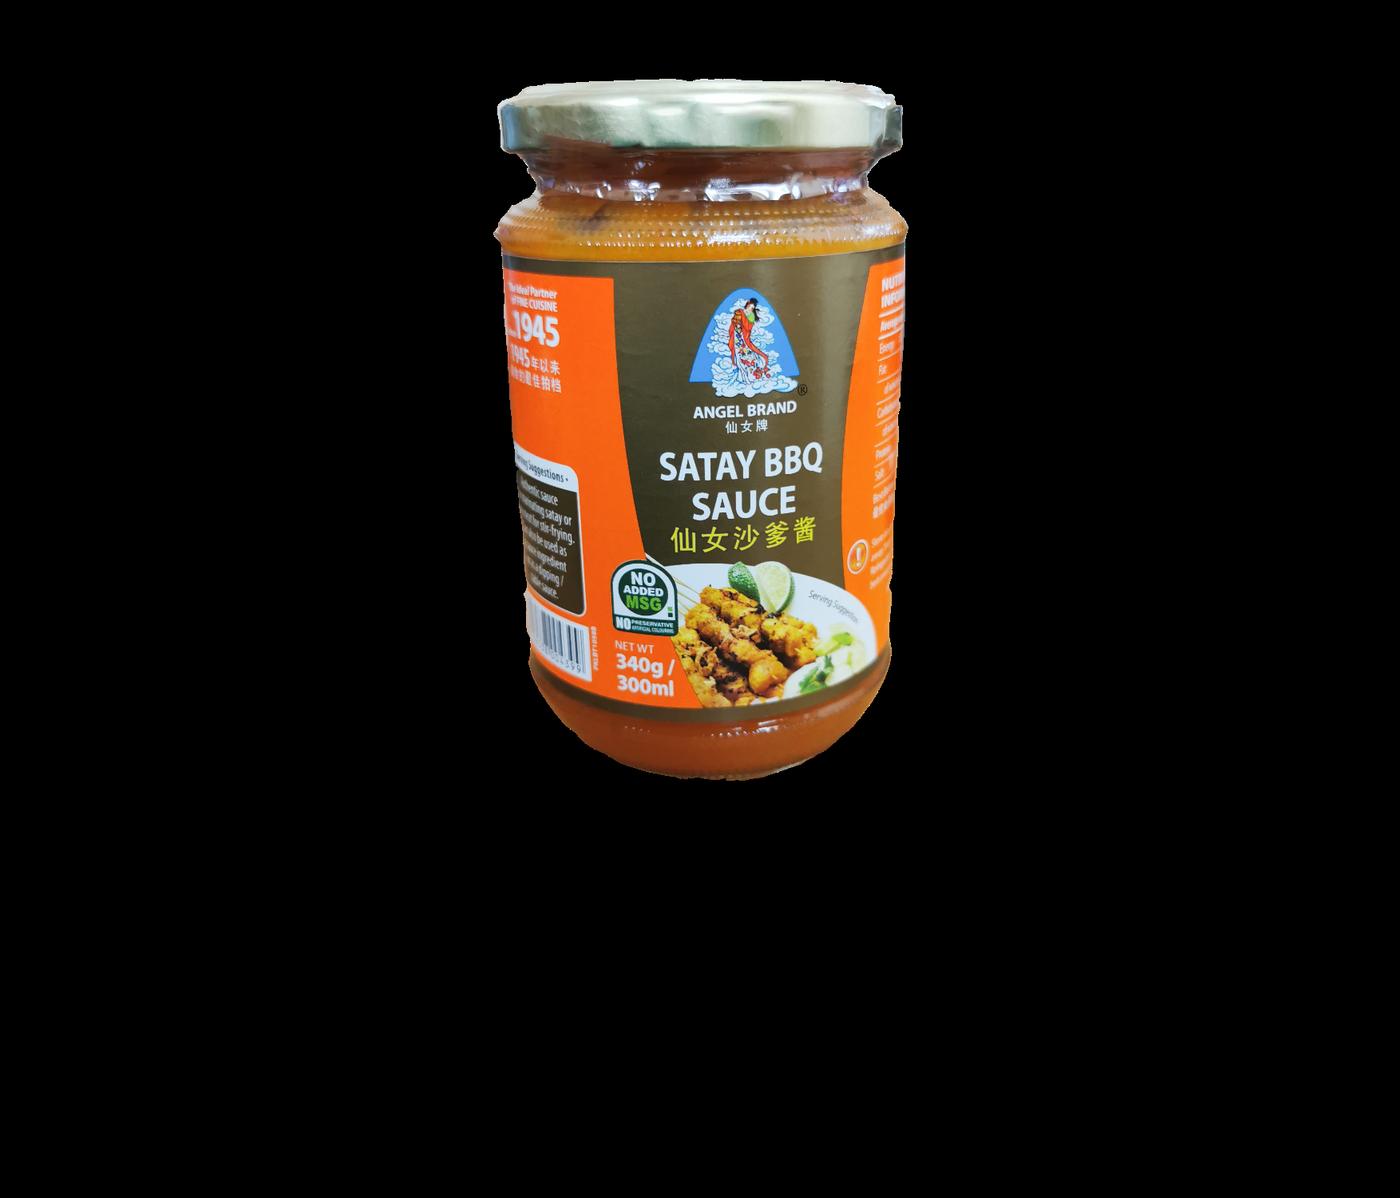 Angel Brand Satay BBQ Sauce